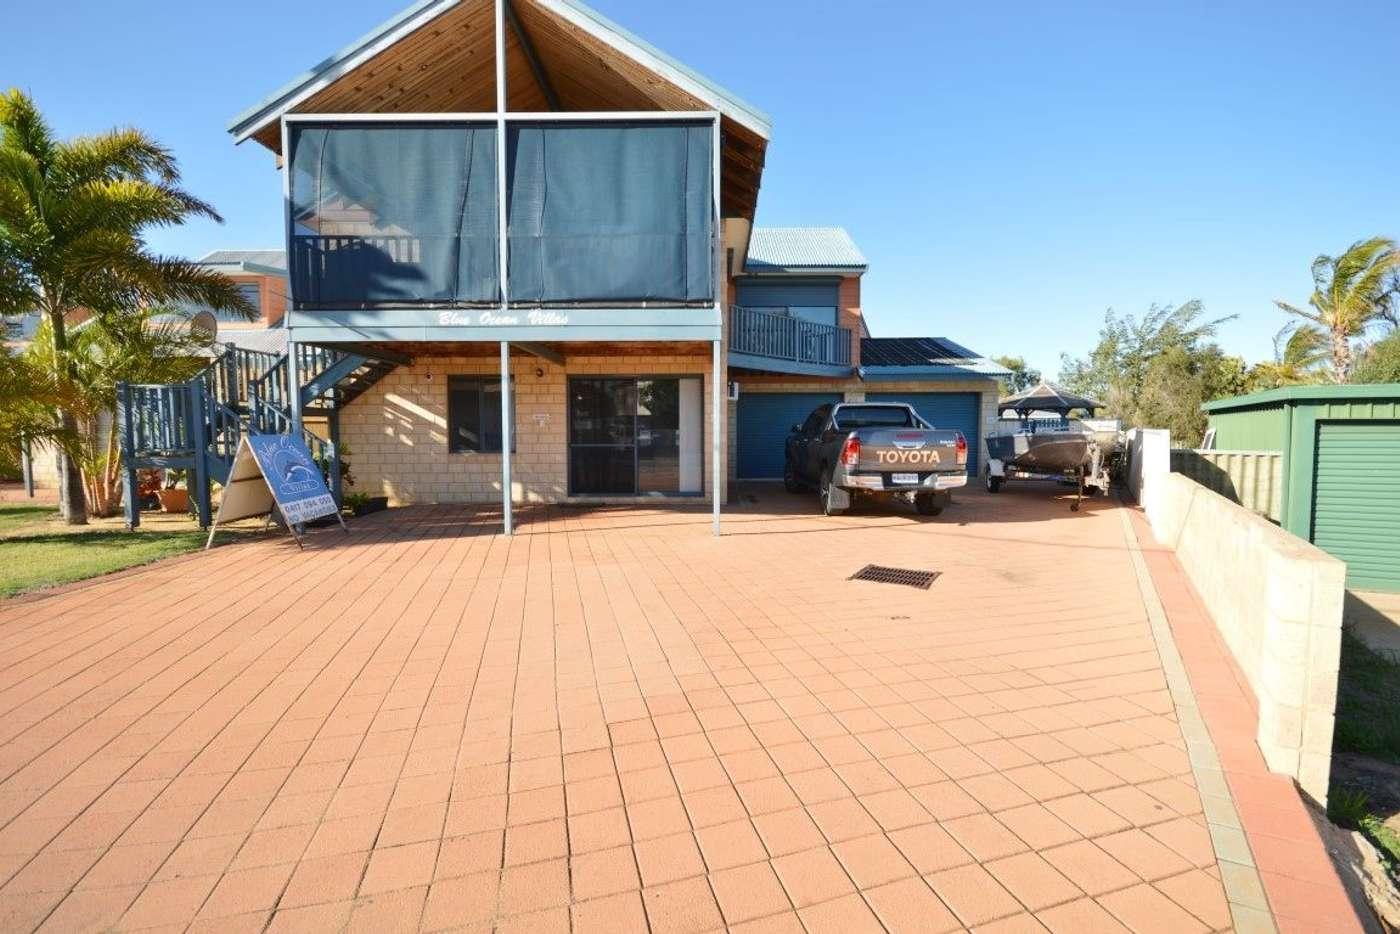 Main view of Homely house listing, 1/22 Mortimer Street, Kalbarri WA 6536